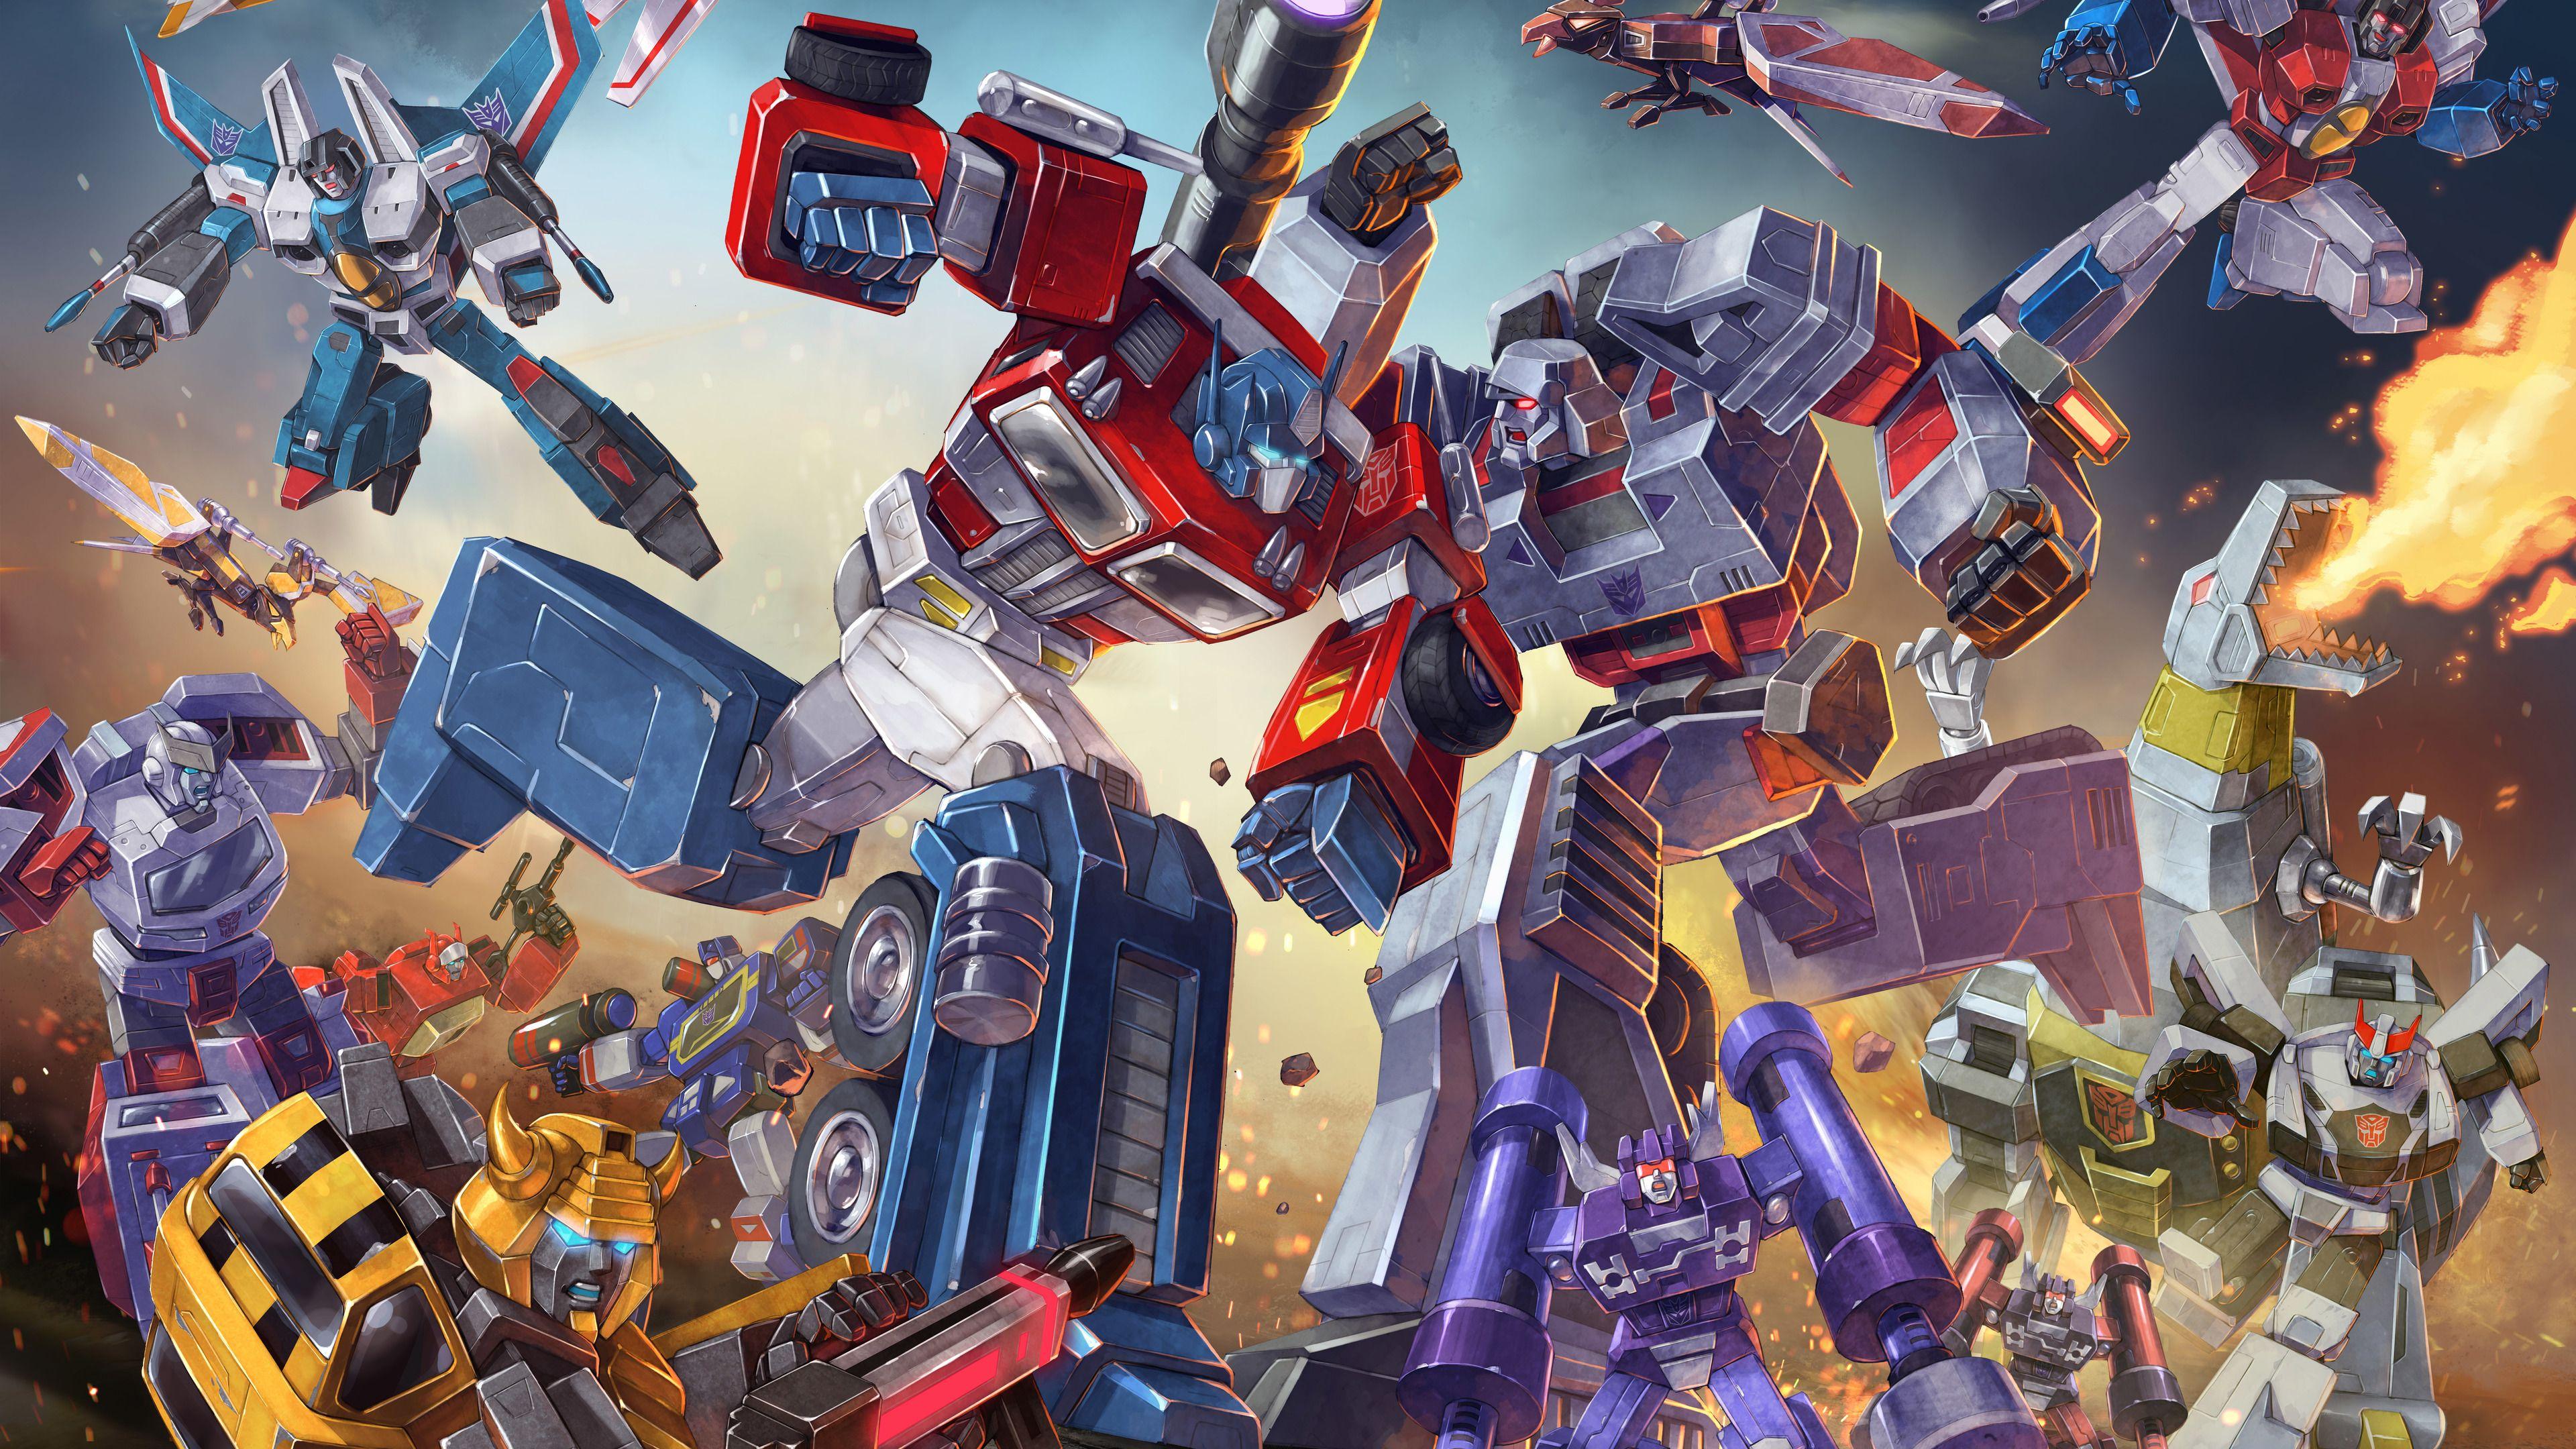 Transformers Earth Wars Transformers Wallpapers Hd Wallpapers 8k Wallpapers 5k Wallpapers 4k Wallpapers 10 Transformers Transformers Prime Transformers G1